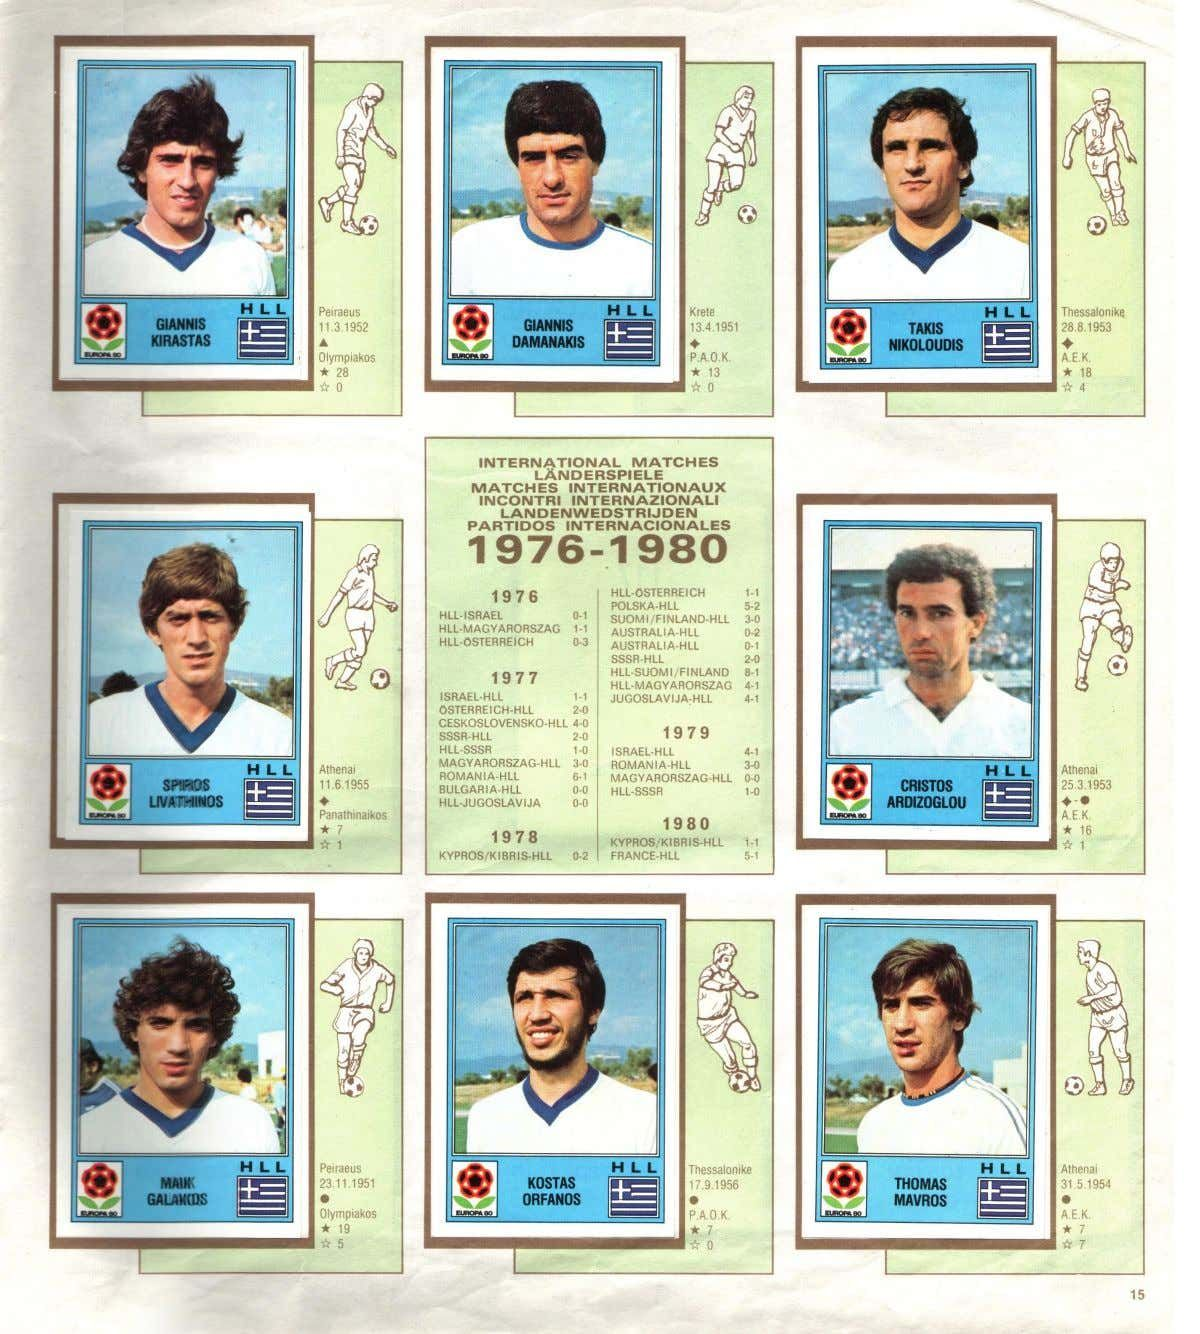 Panini Europa 80 Sticker Album Document Sharing European Championships [ 1334 x 1200 Pixel ]